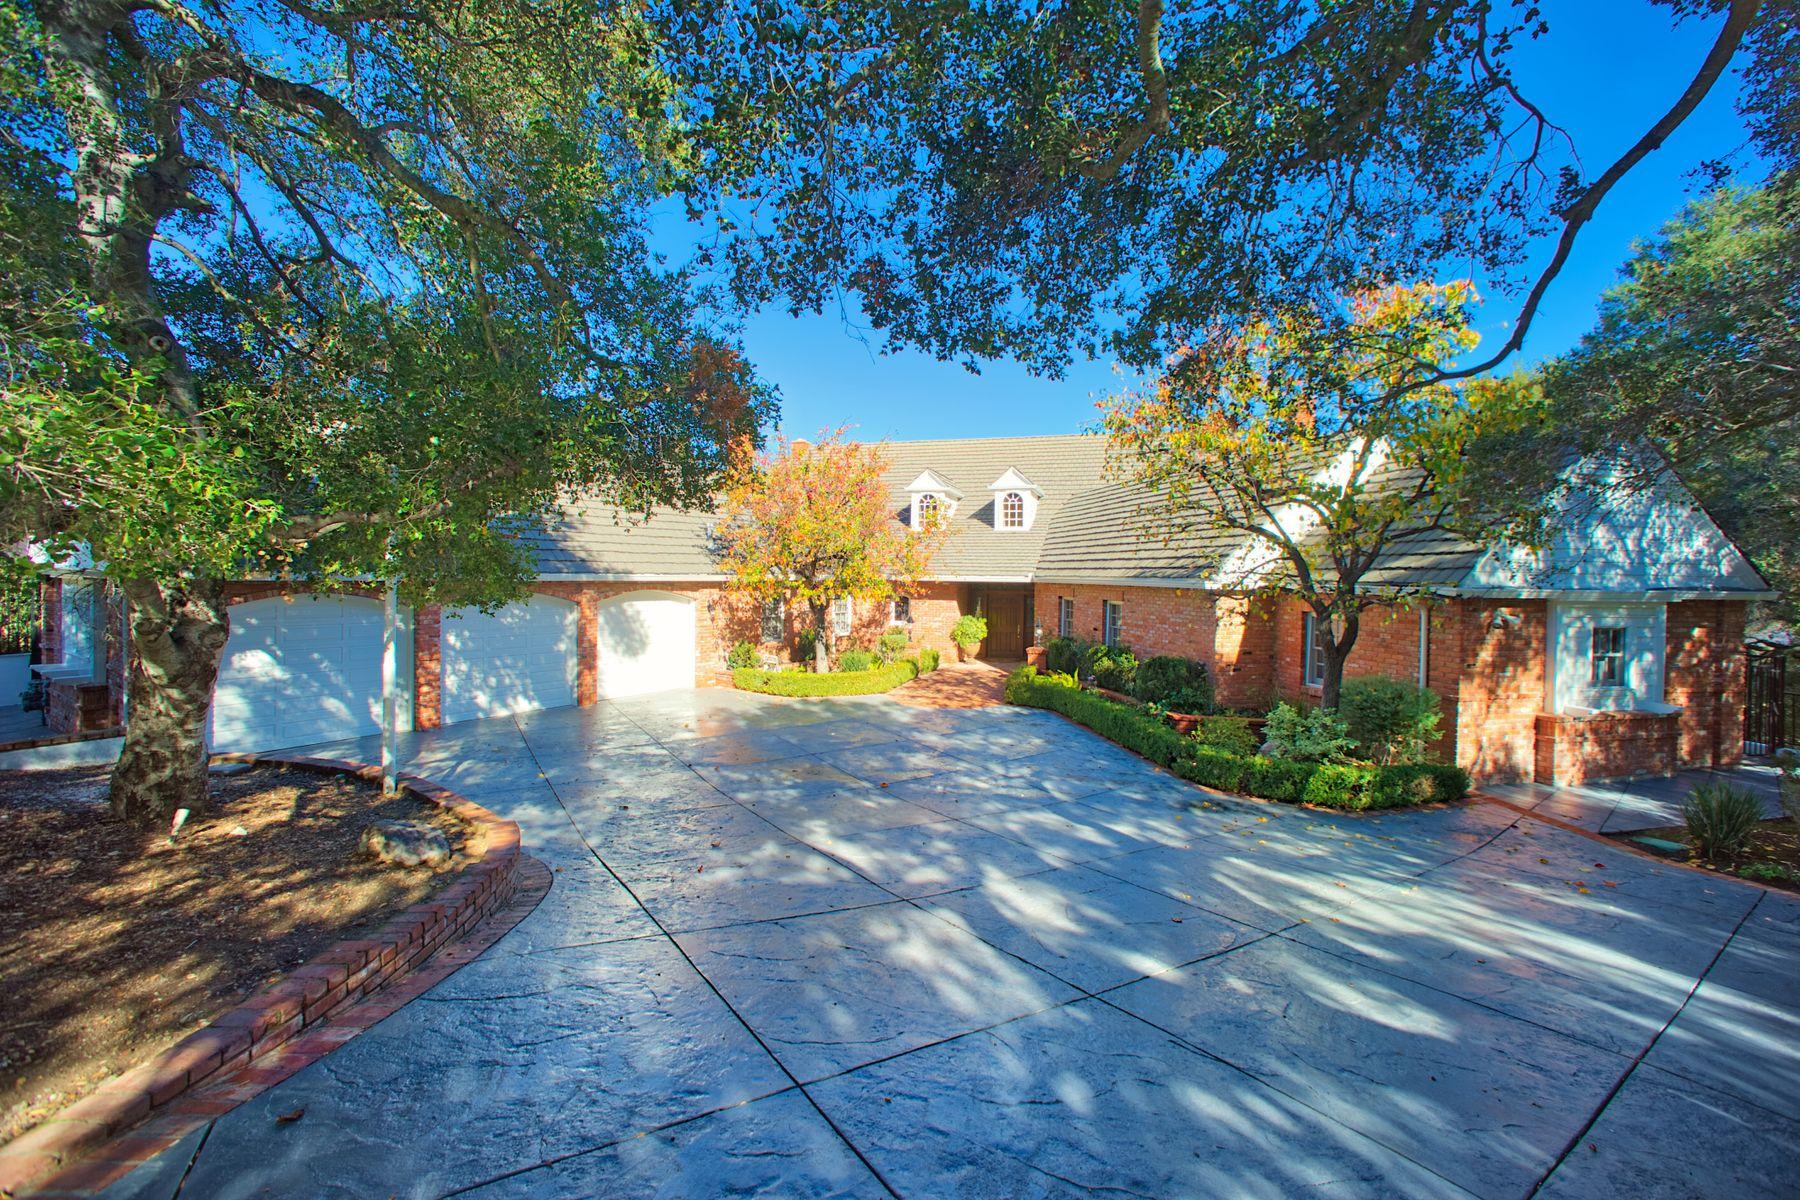 Single Family Homes for Sale at 506 Oakhampton Street Thousand Oaks, California 91361 United States